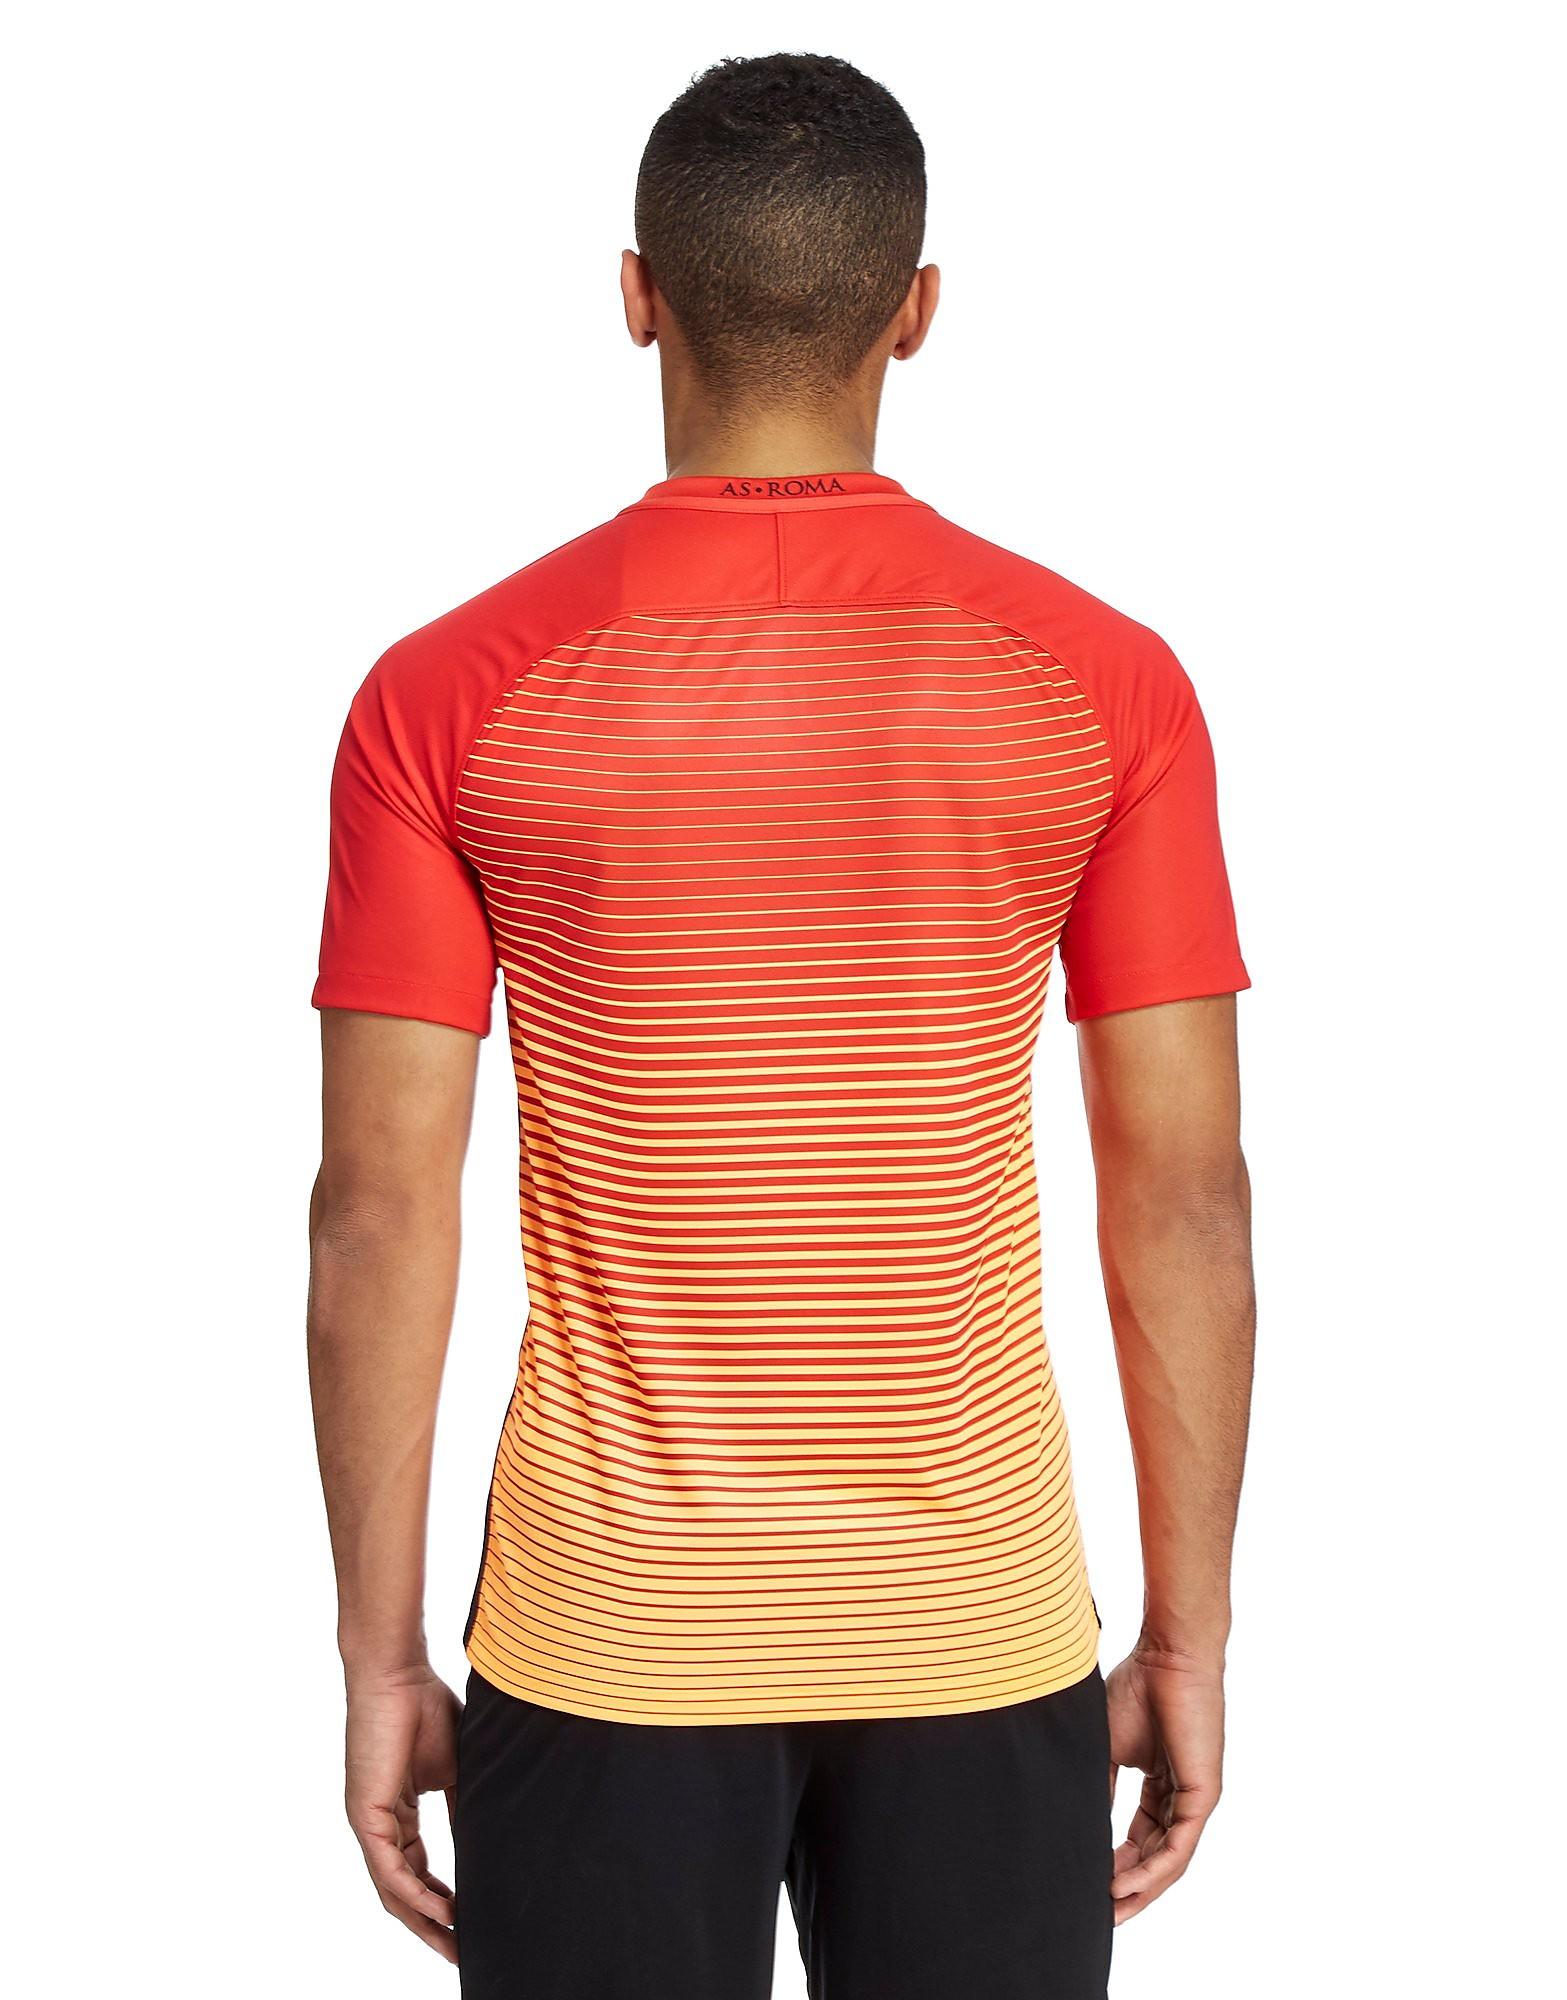 Nike Roma 2016/17 Third Shirt